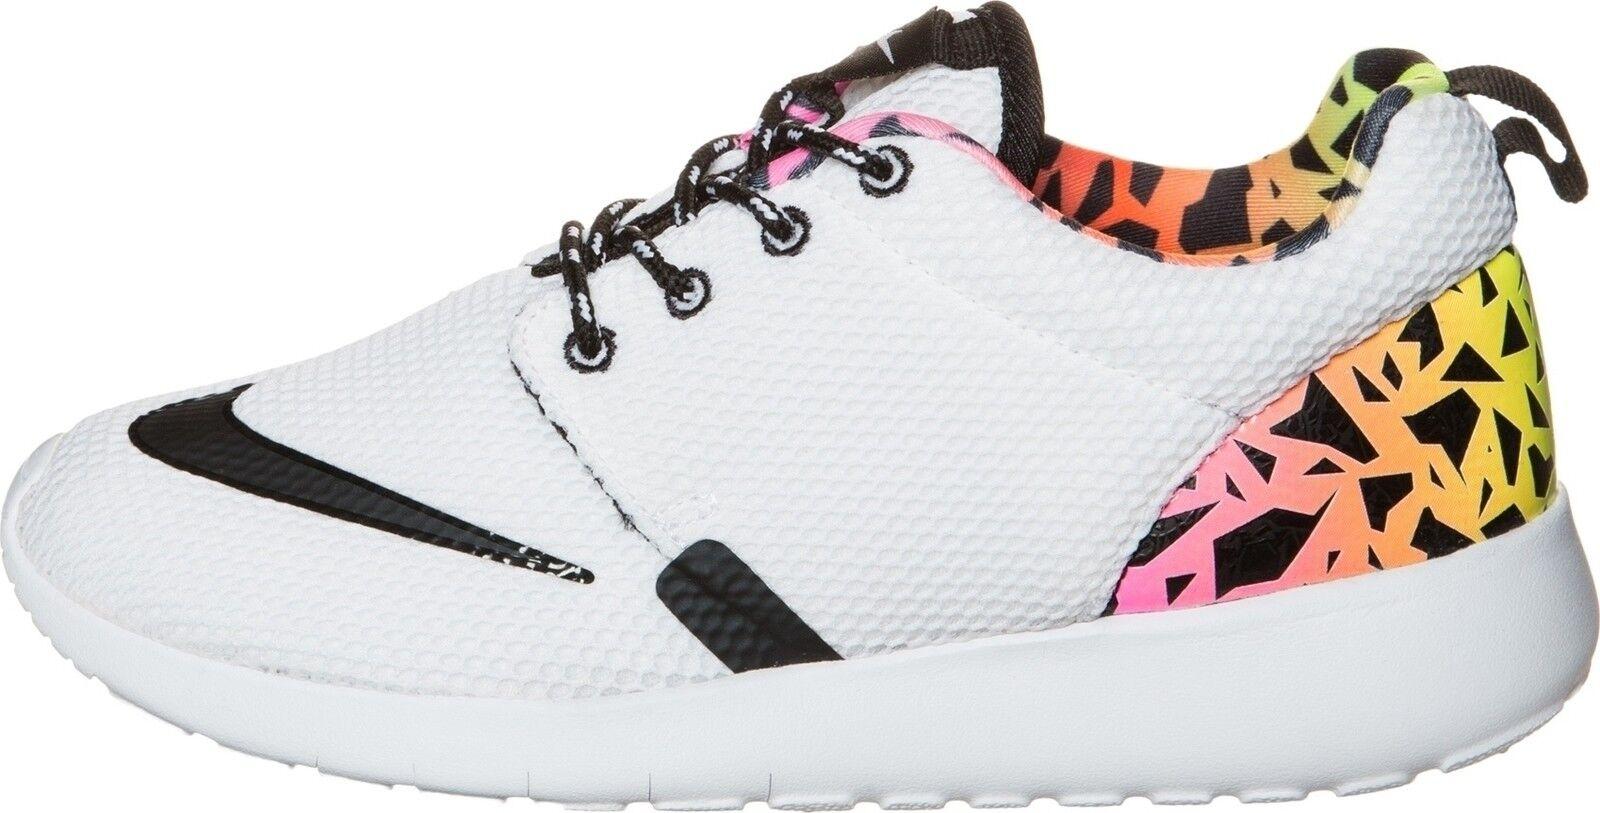 Damenschuhe Nike Roshe Presto One FB Neu Gr:40 Presto Roshe Moire Sneake 810513-100 free flyknit e9c97d